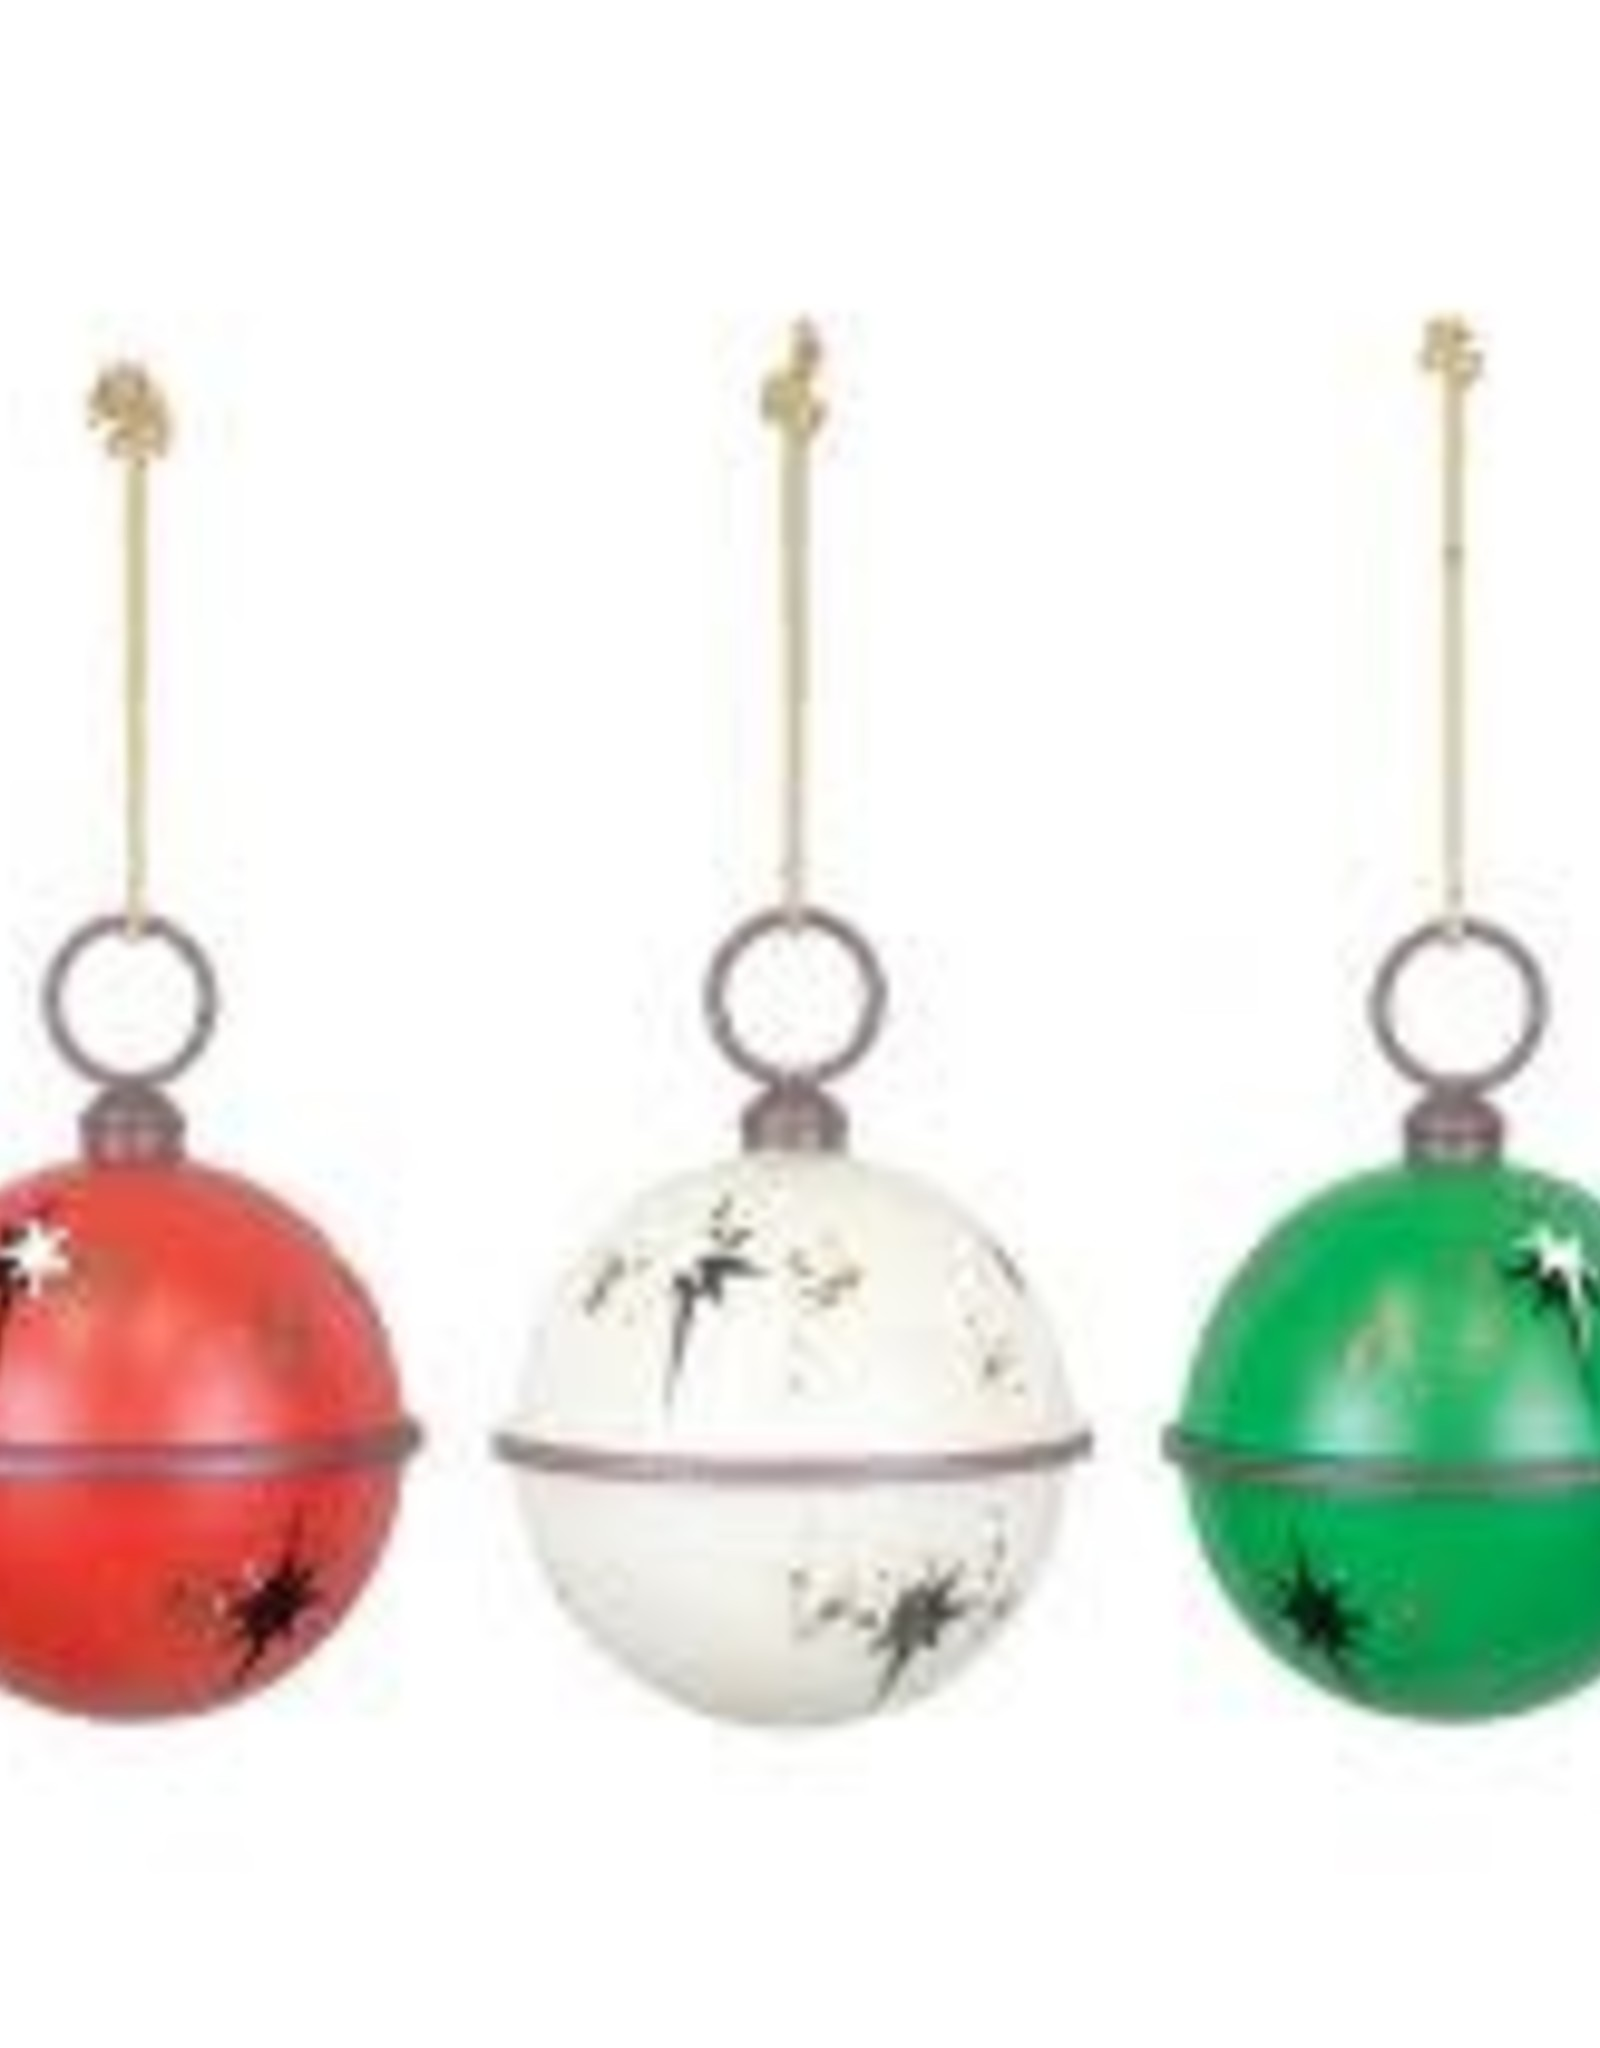 Wink North Star Jingle Bell Hanger